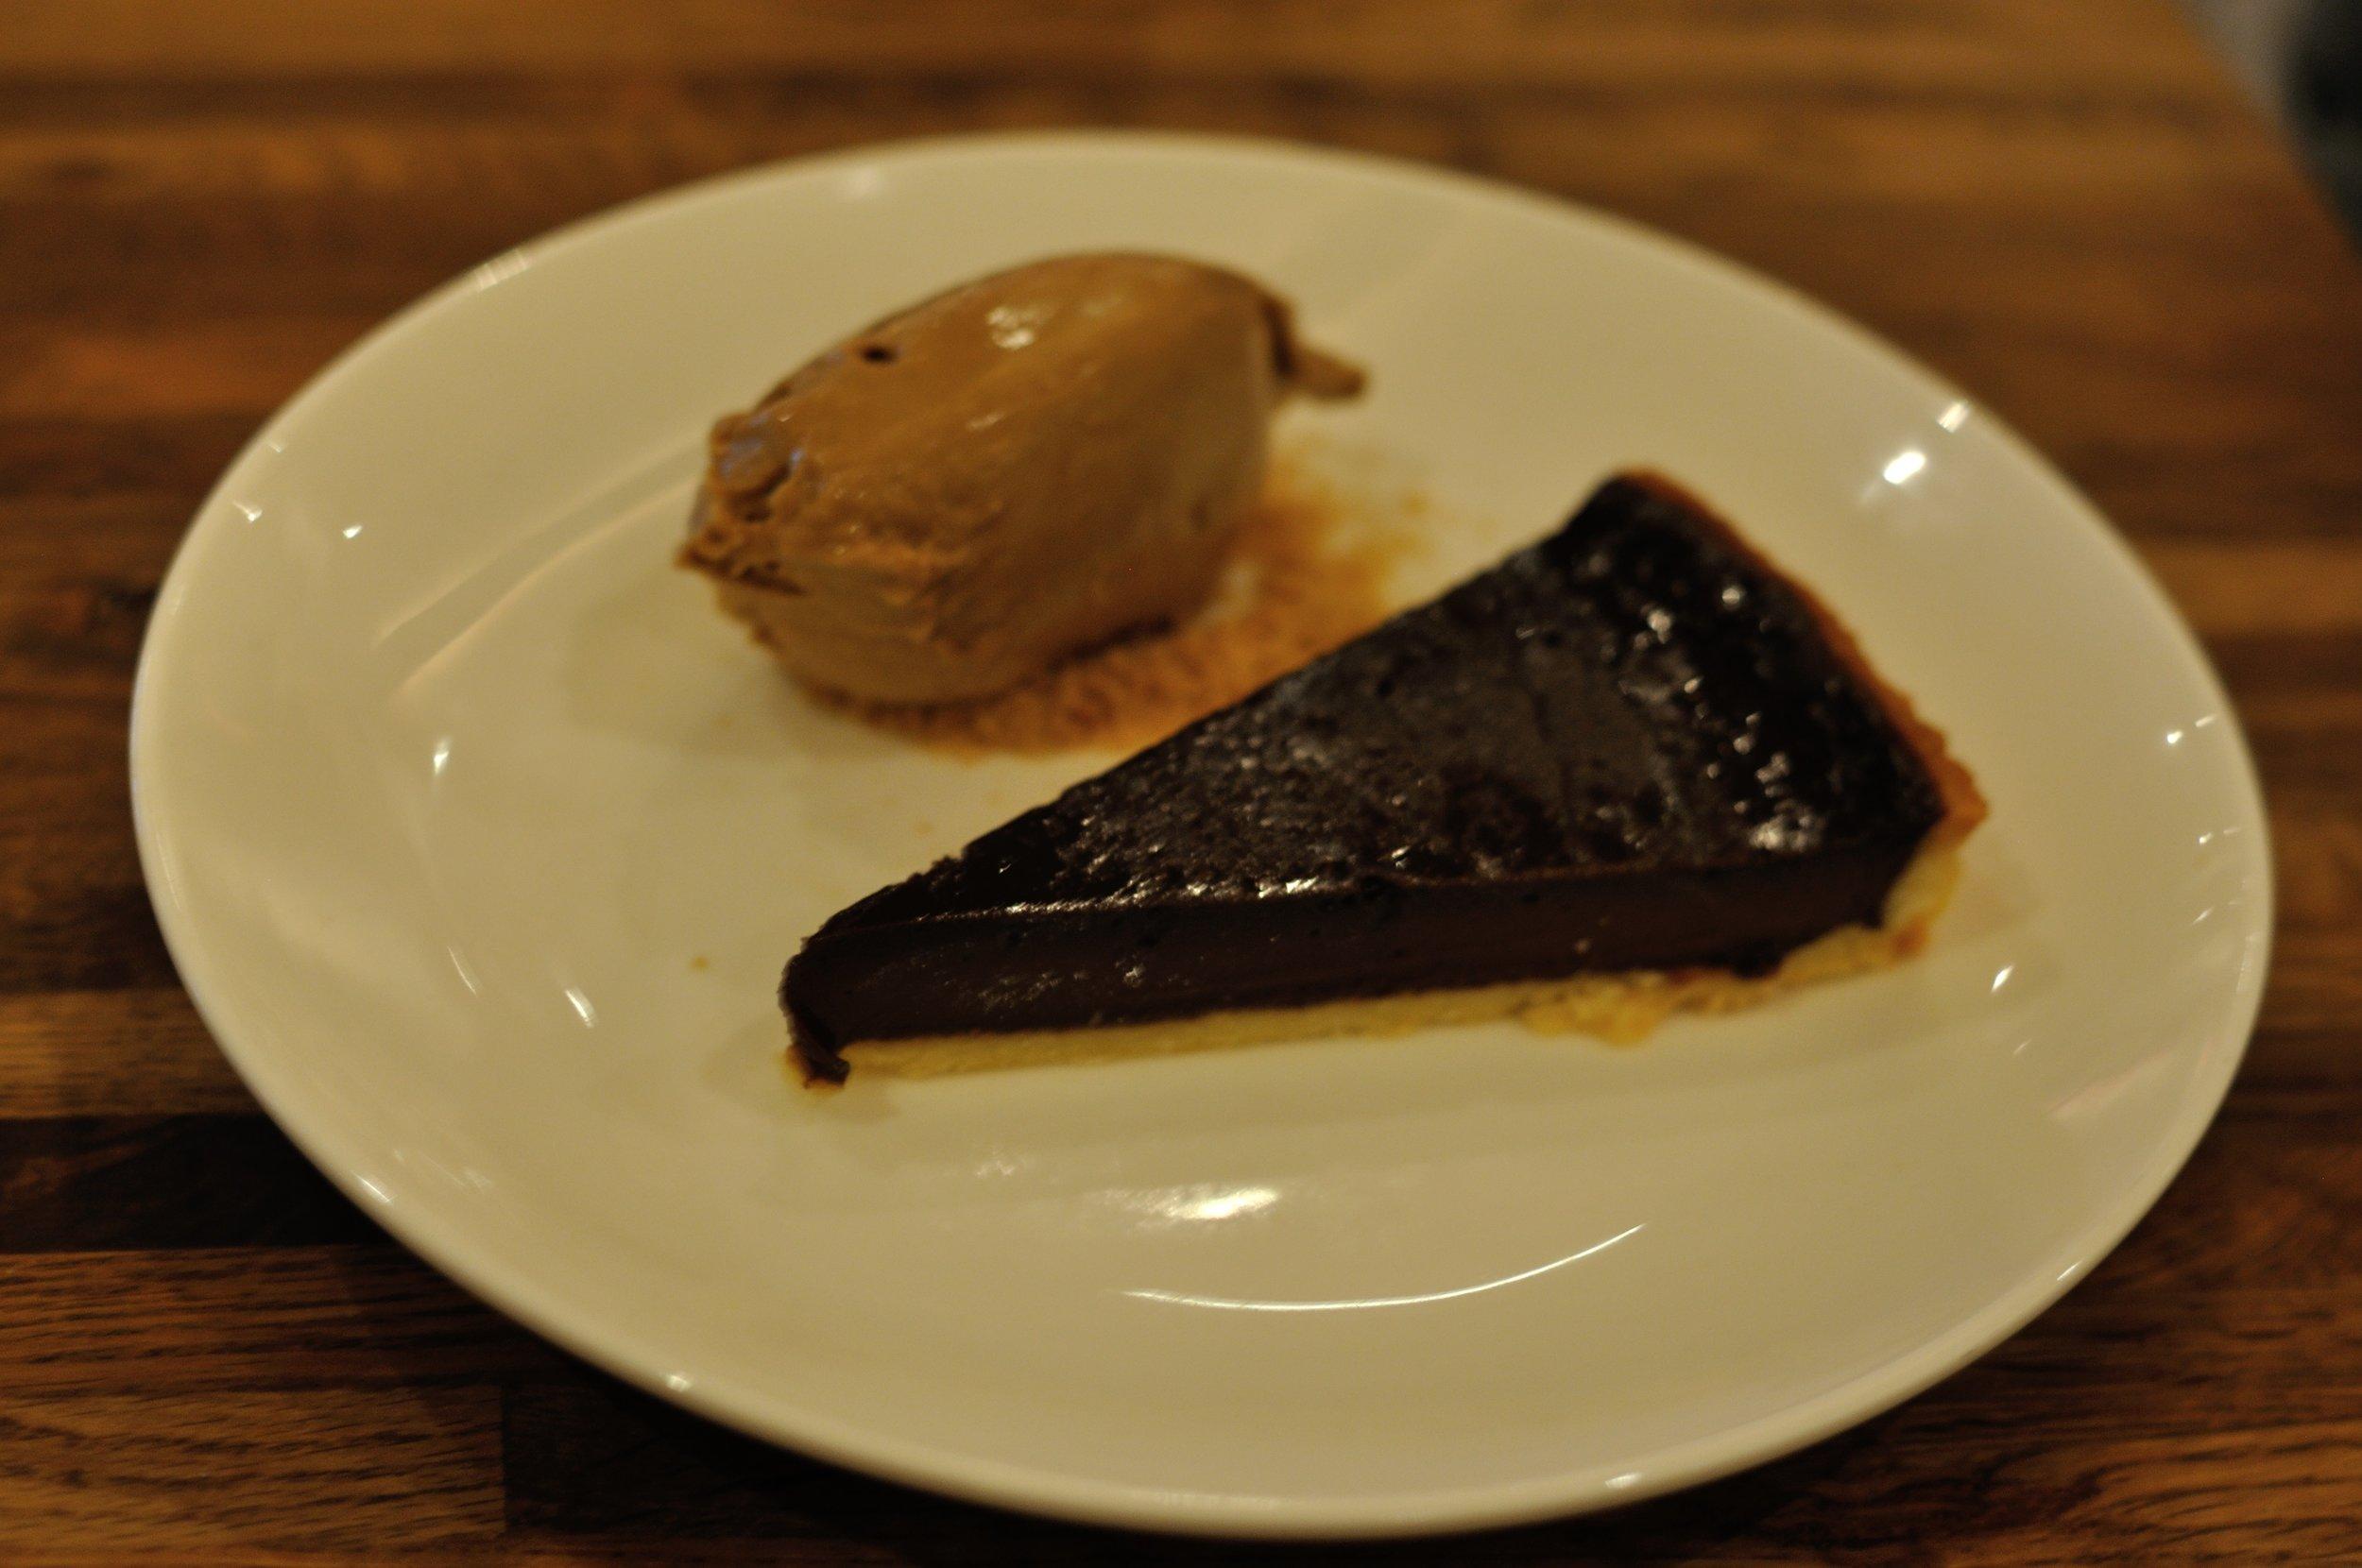 Deliciously decadent chocolate tart